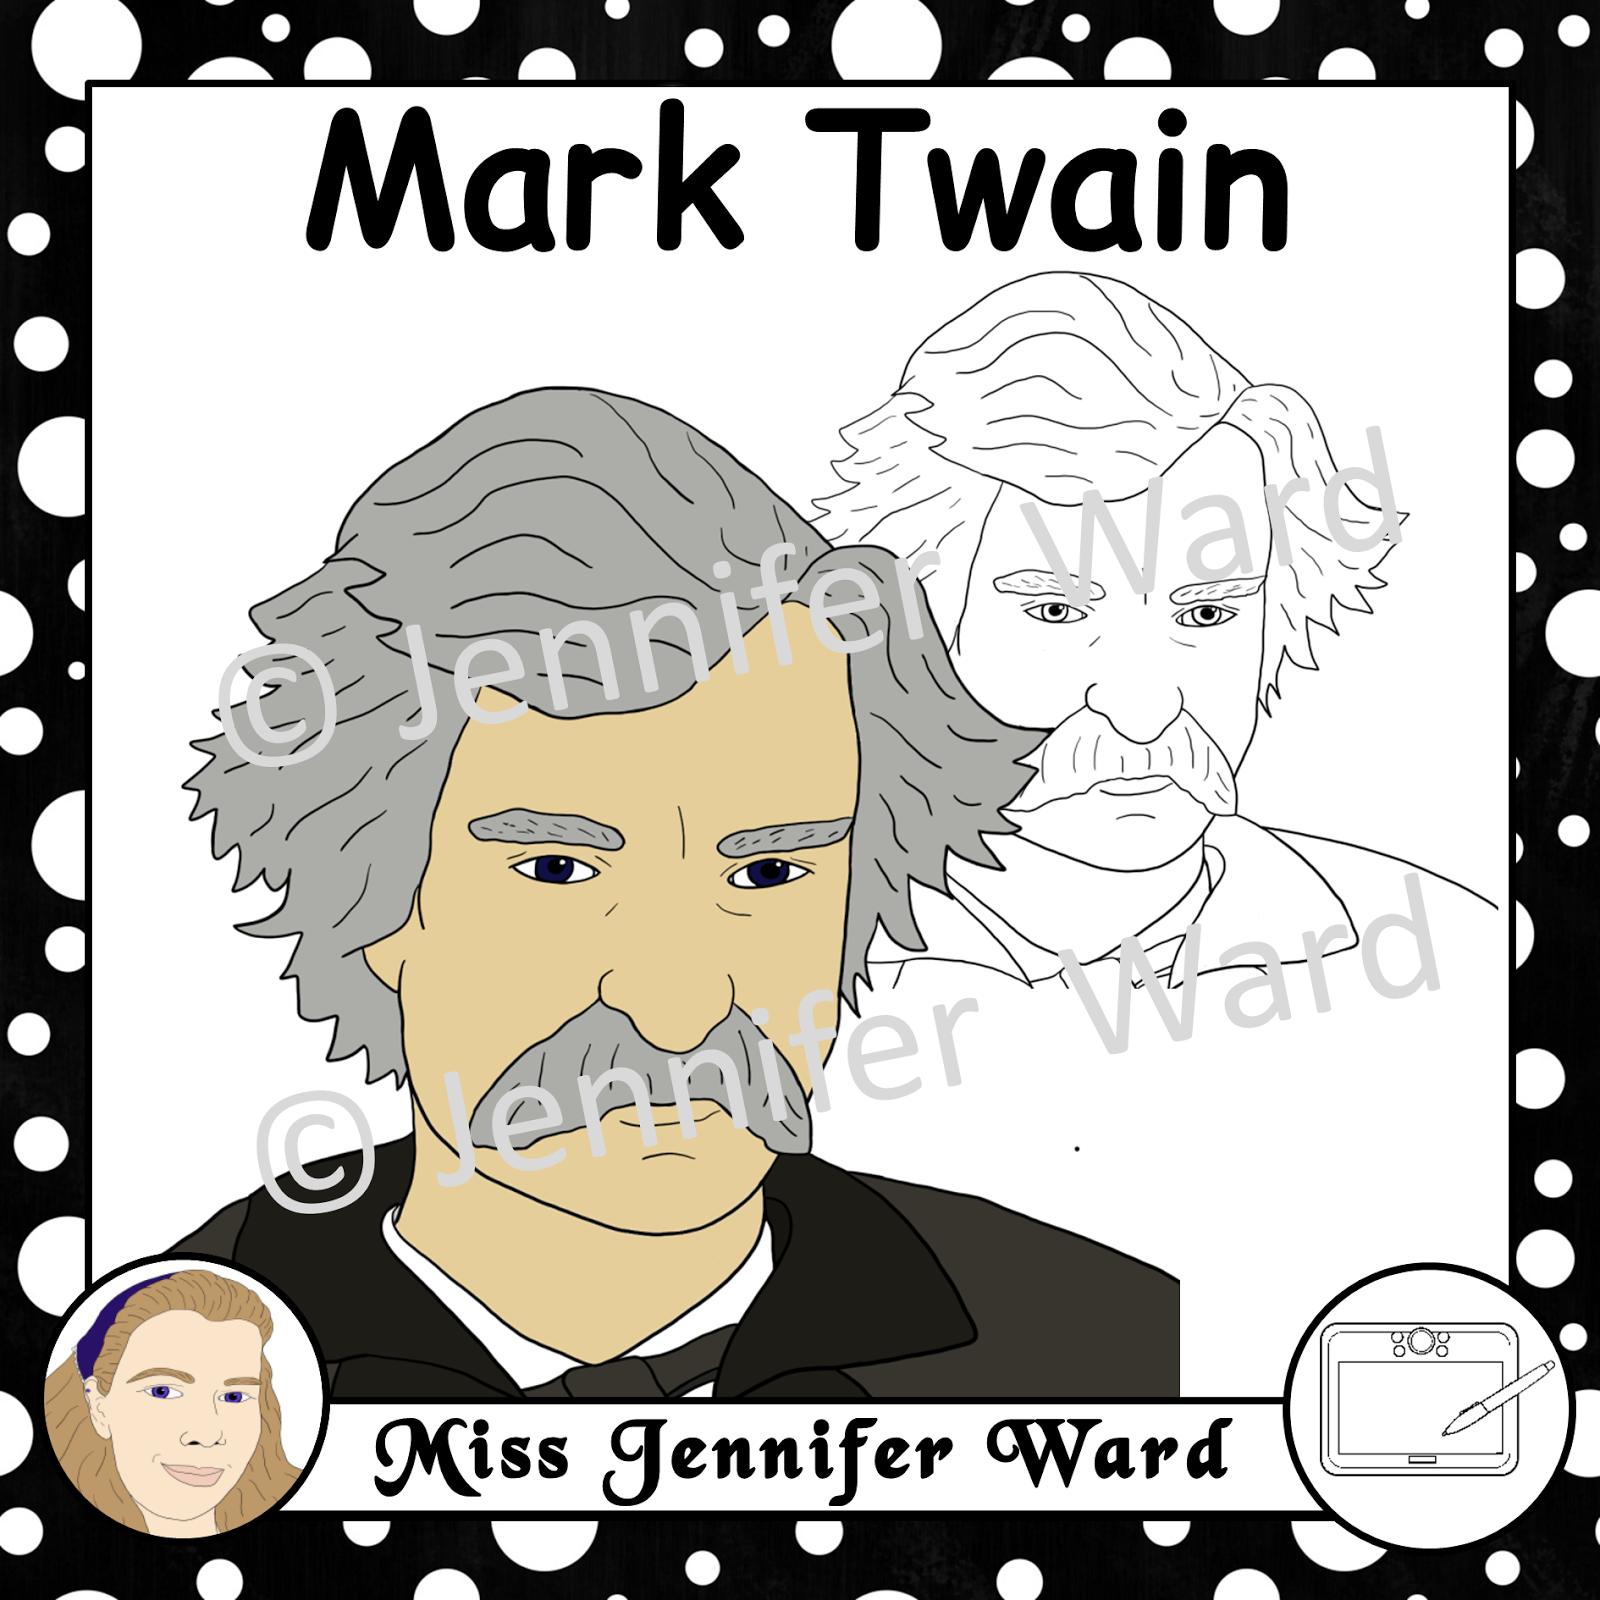 https://www.teacherspayteachers.com/Product/Mark-Twain-Clipart-2429089